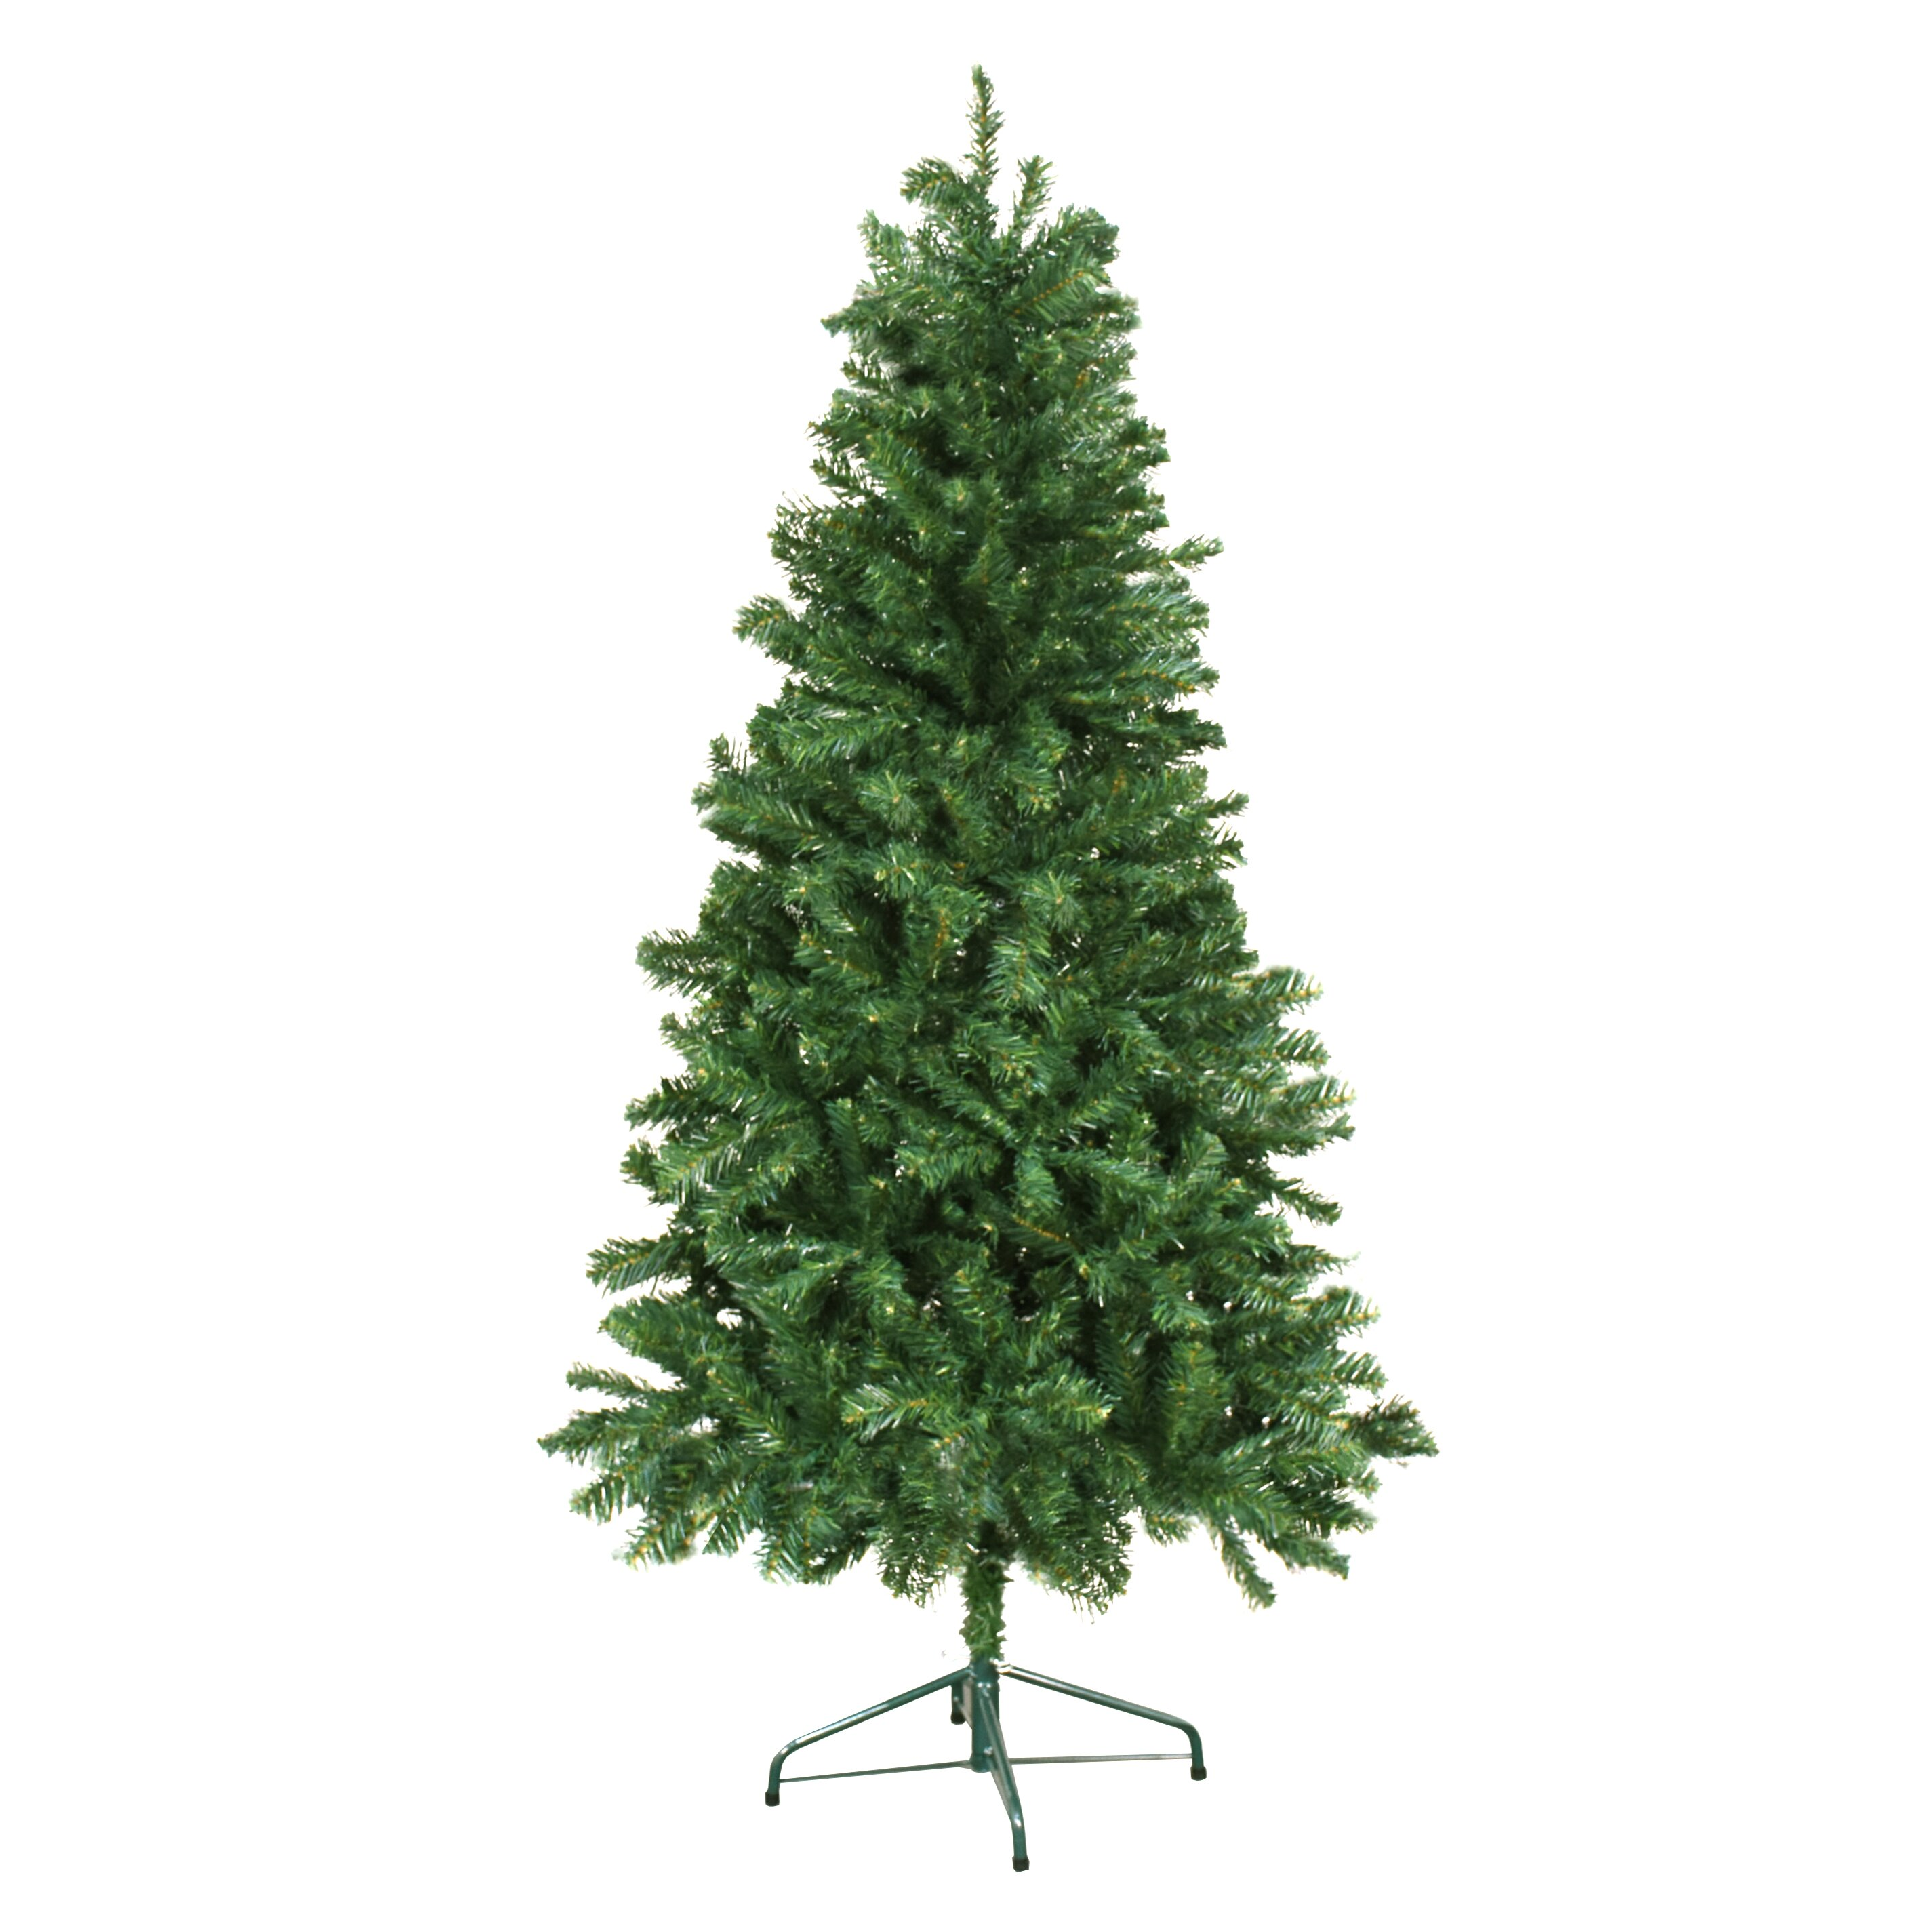 Douglas Fir Artificial Christmas Trees: Astella 6' Green Douglas Fir Artificial Christmas Tree